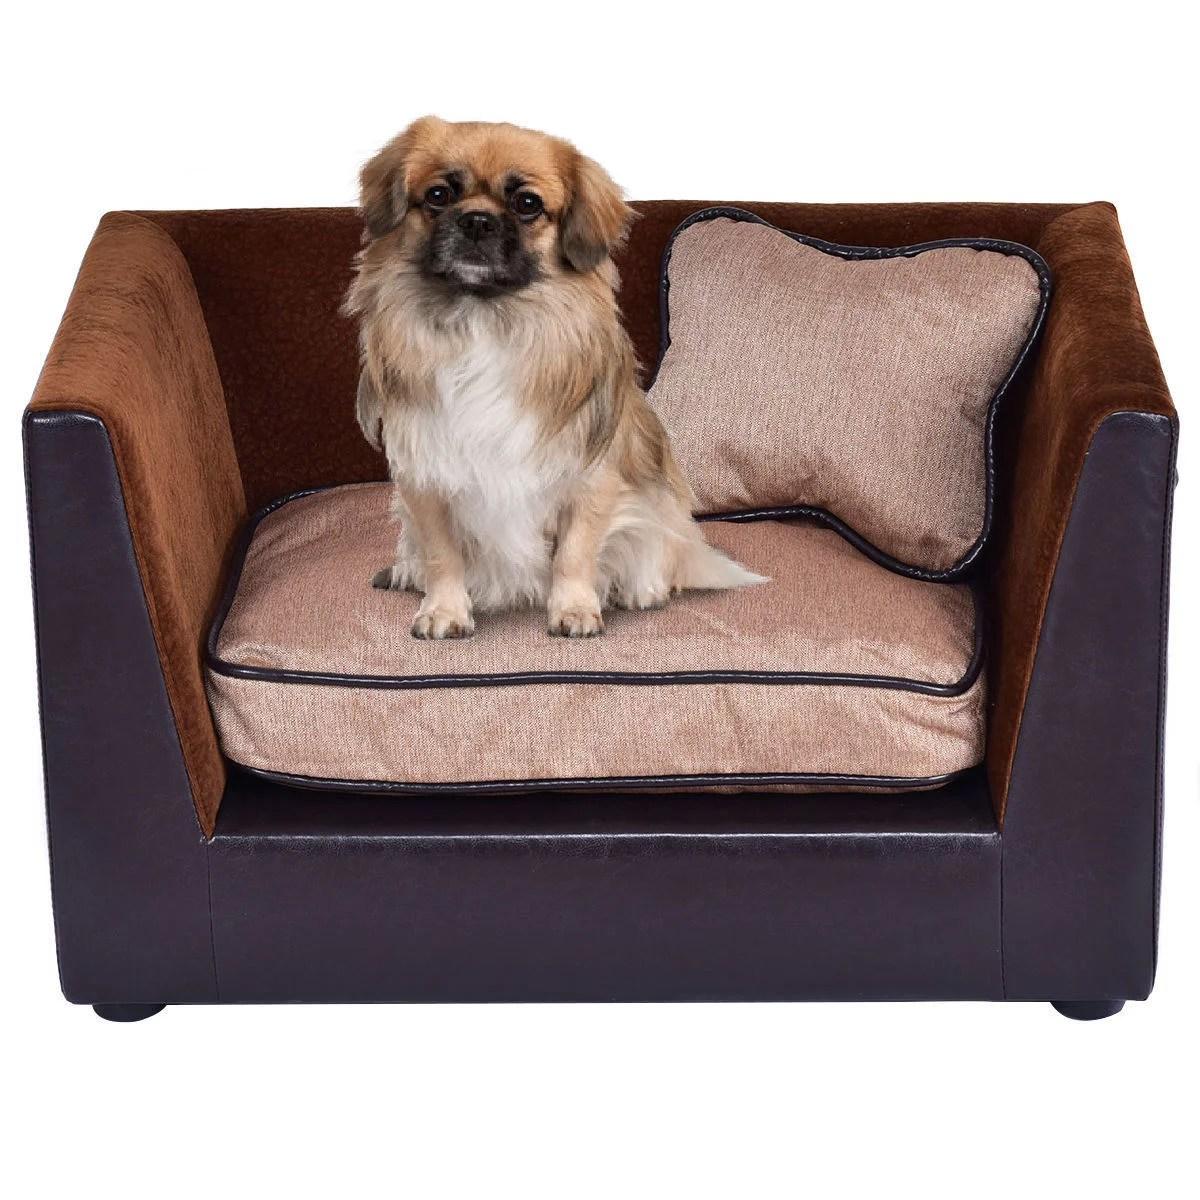 soft sofa dog bed diy concrete table costway pet lounge puppy pu warm snuggle qty